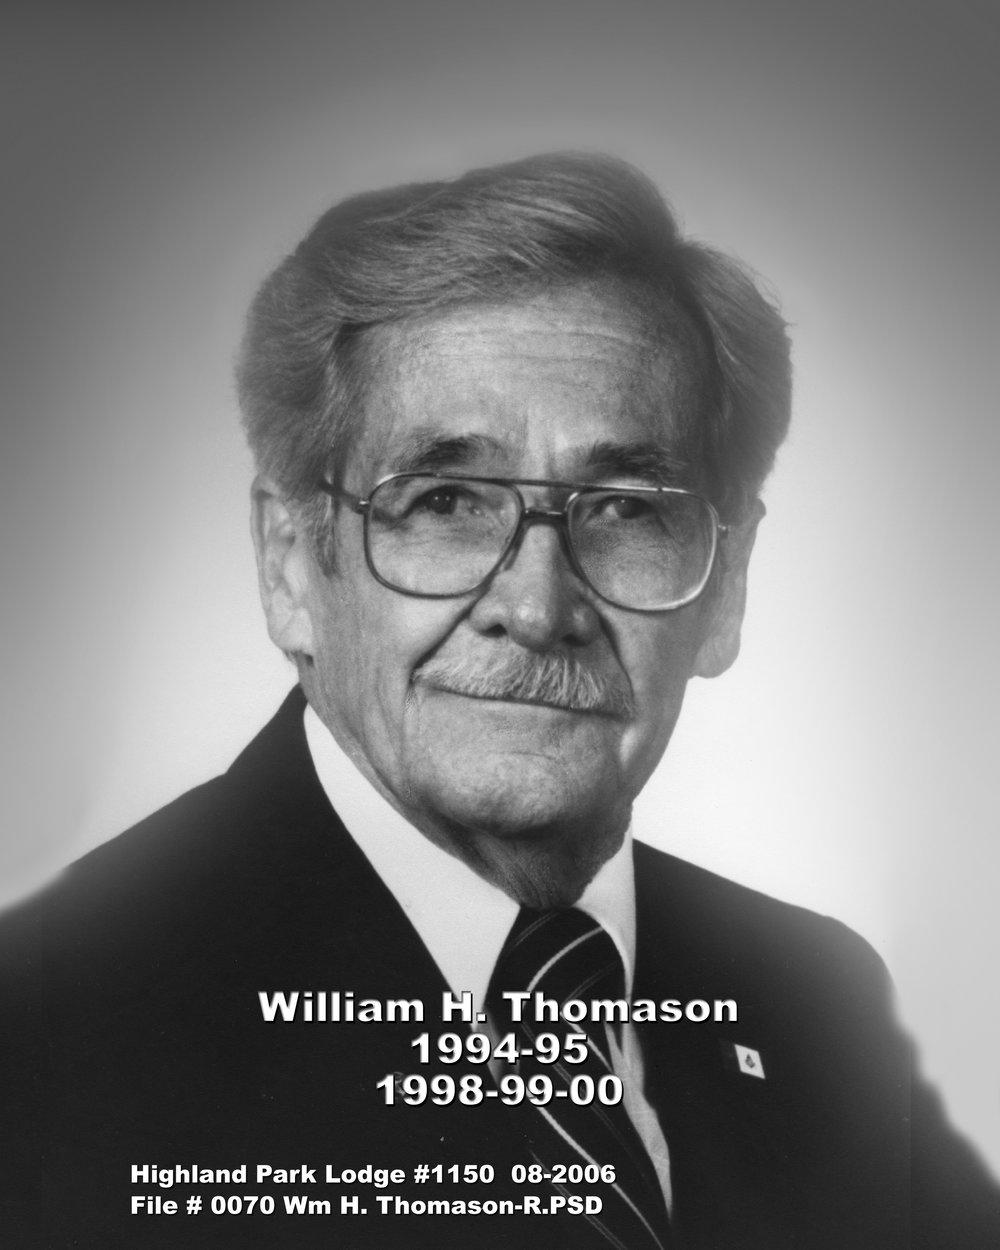 0070 Wm H Thomason-R.jpg